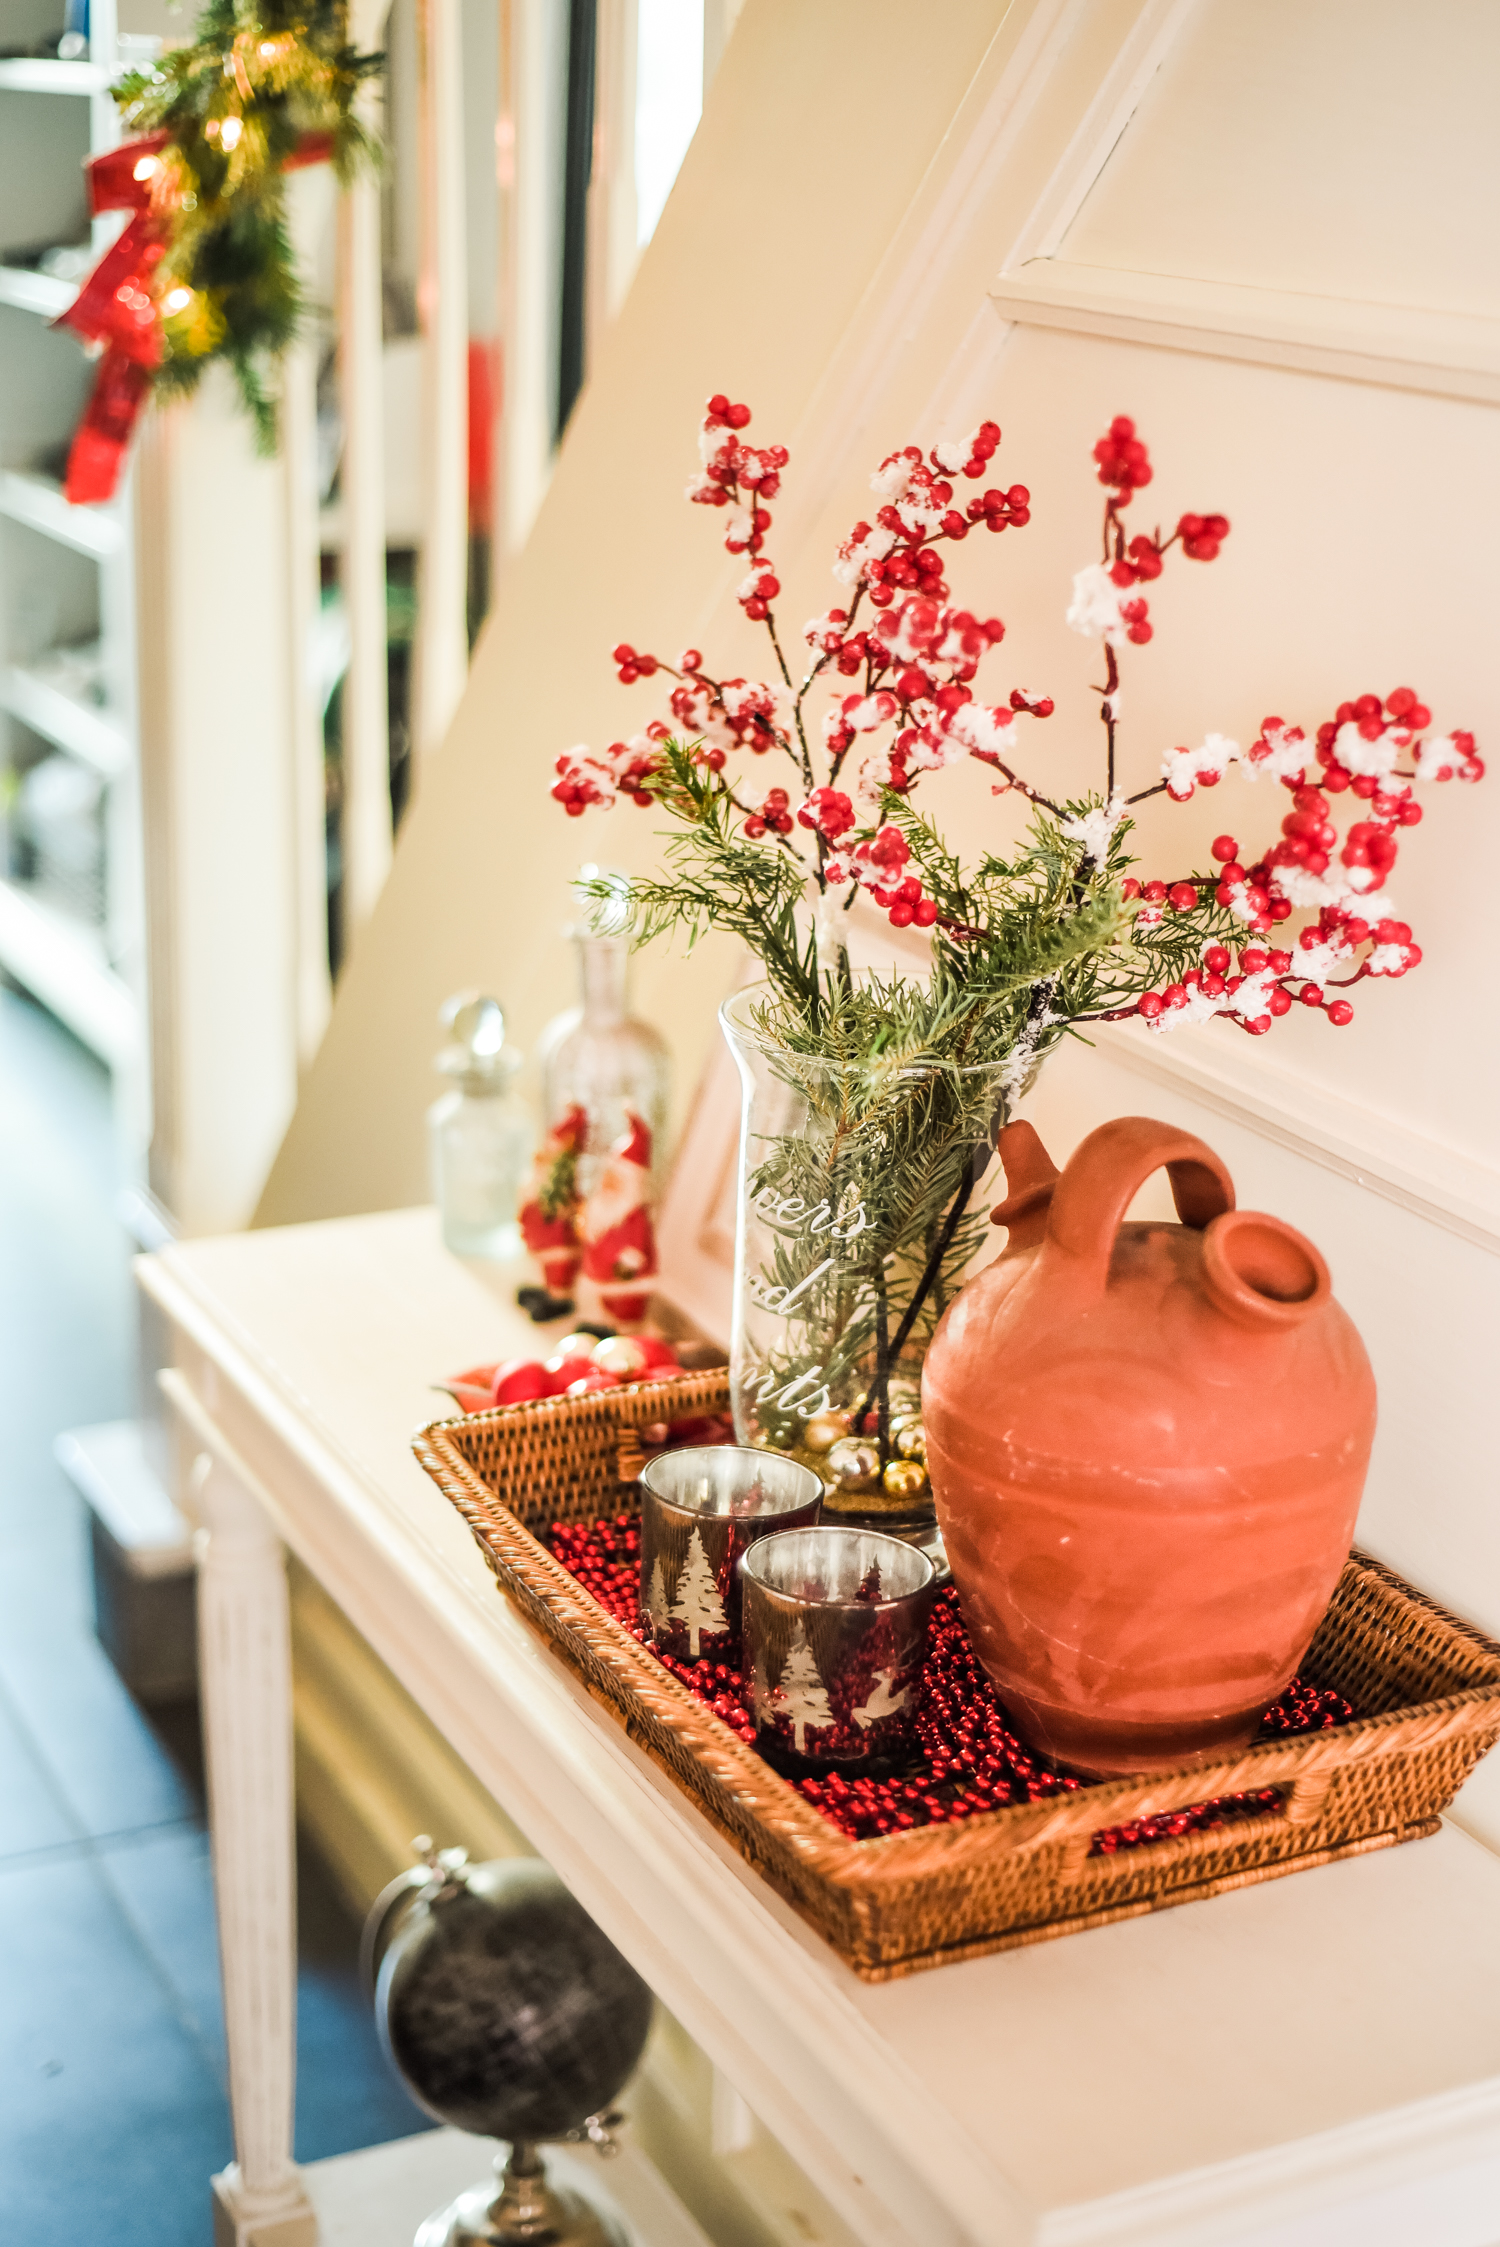 Traditional-Christmas-Decor-Tree-Table-Ideas-Style-To-Copy-AnaisStoelen-81.jpg